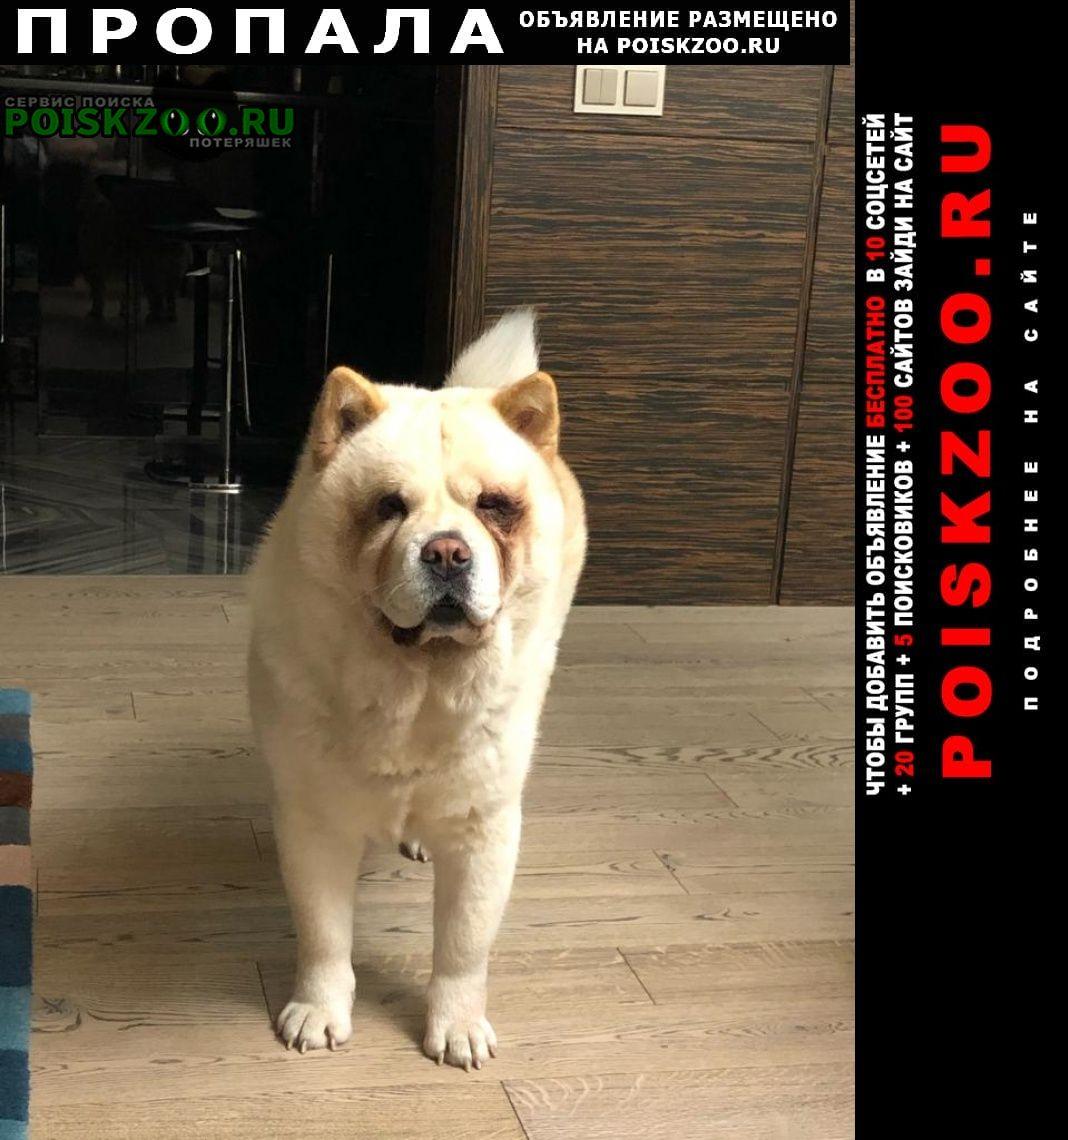 Пропала собака породы чау-чау Троицк